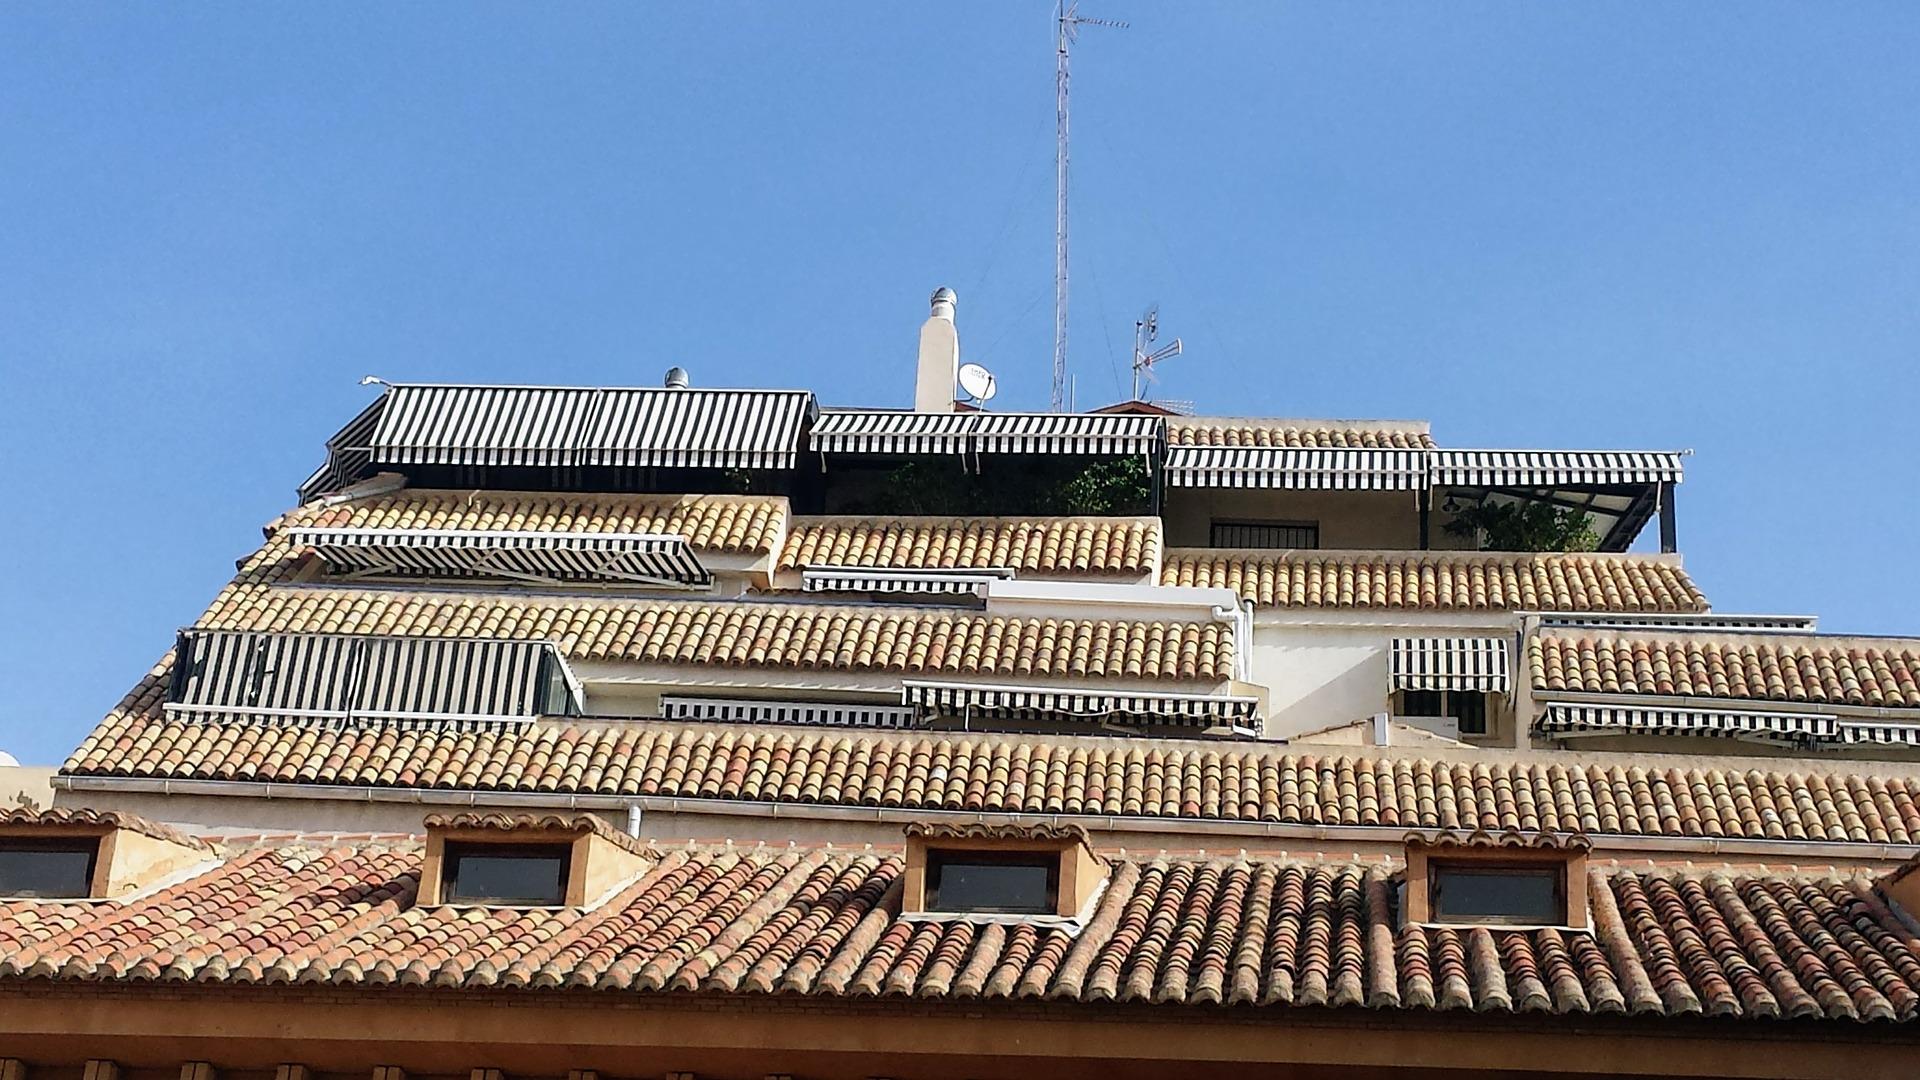 Roofing Gutter Roof Shingles